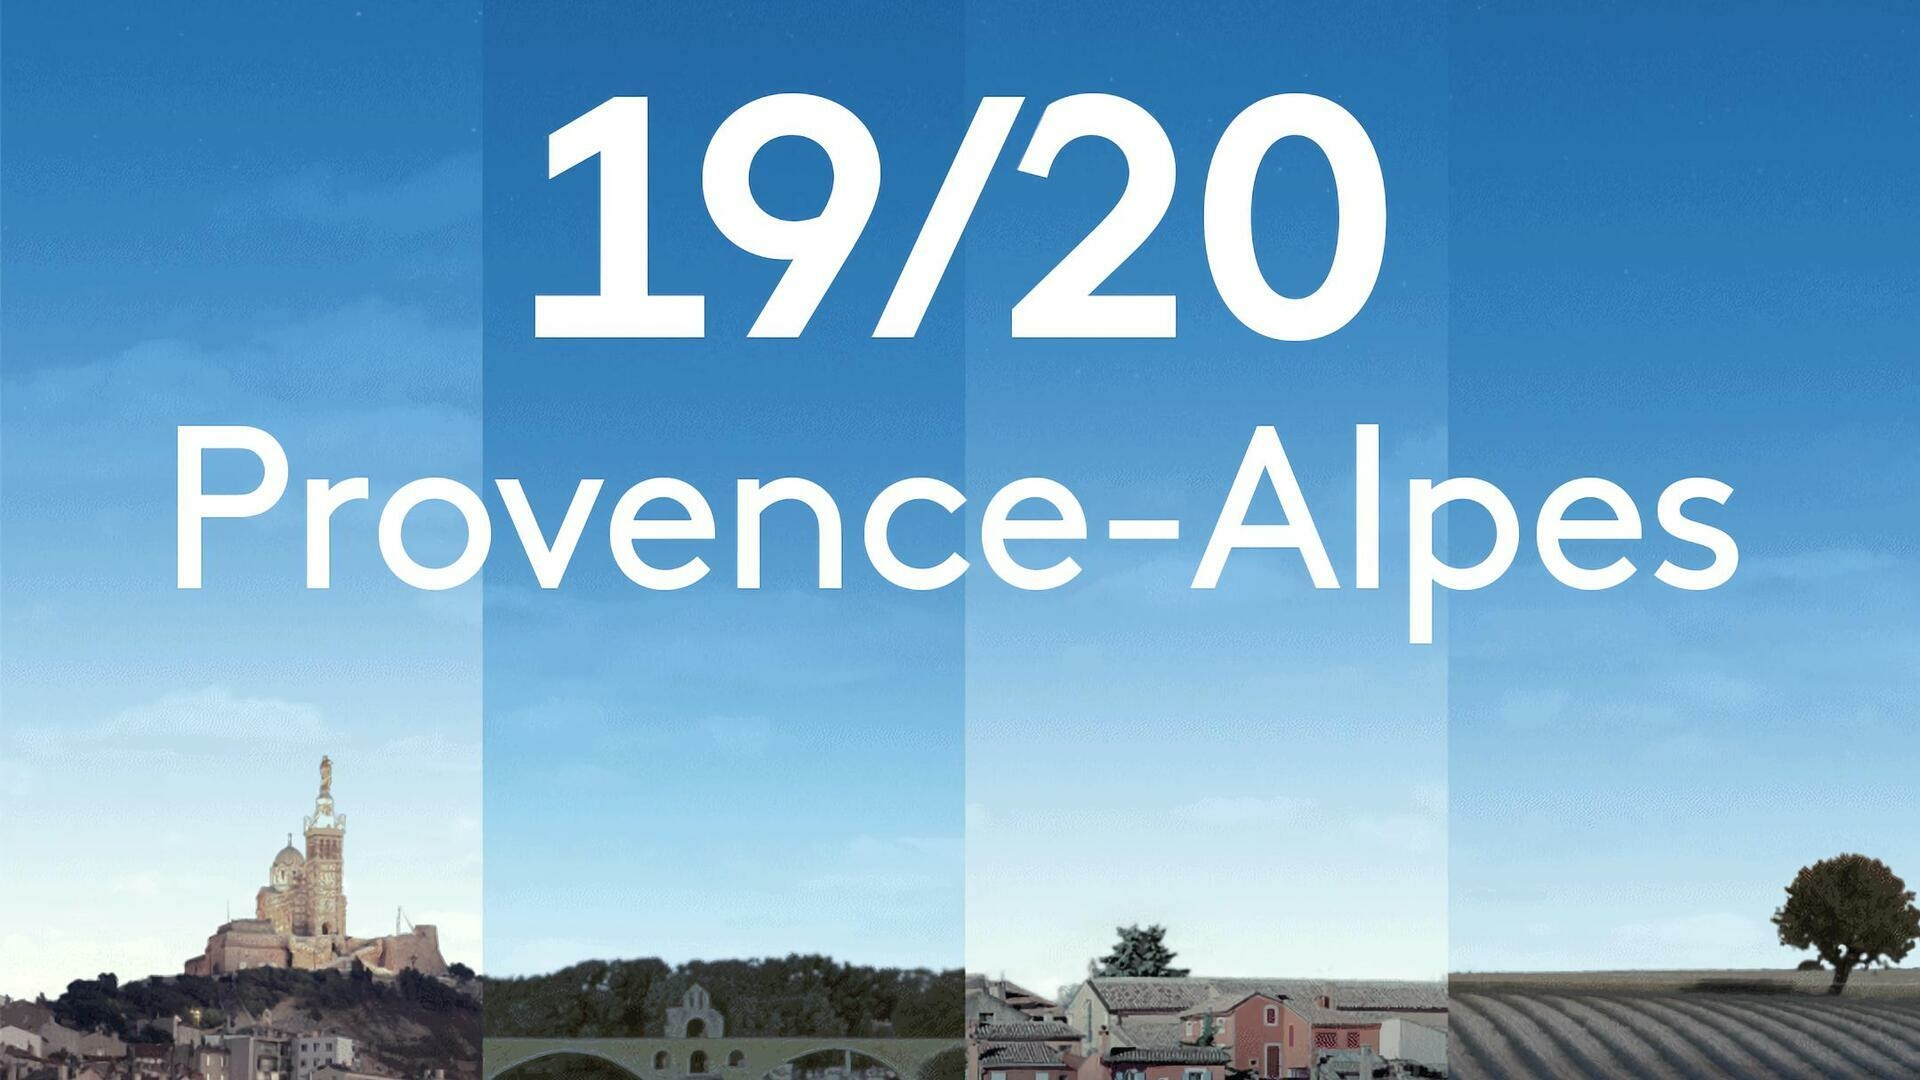 19/20 Provence-Alpes